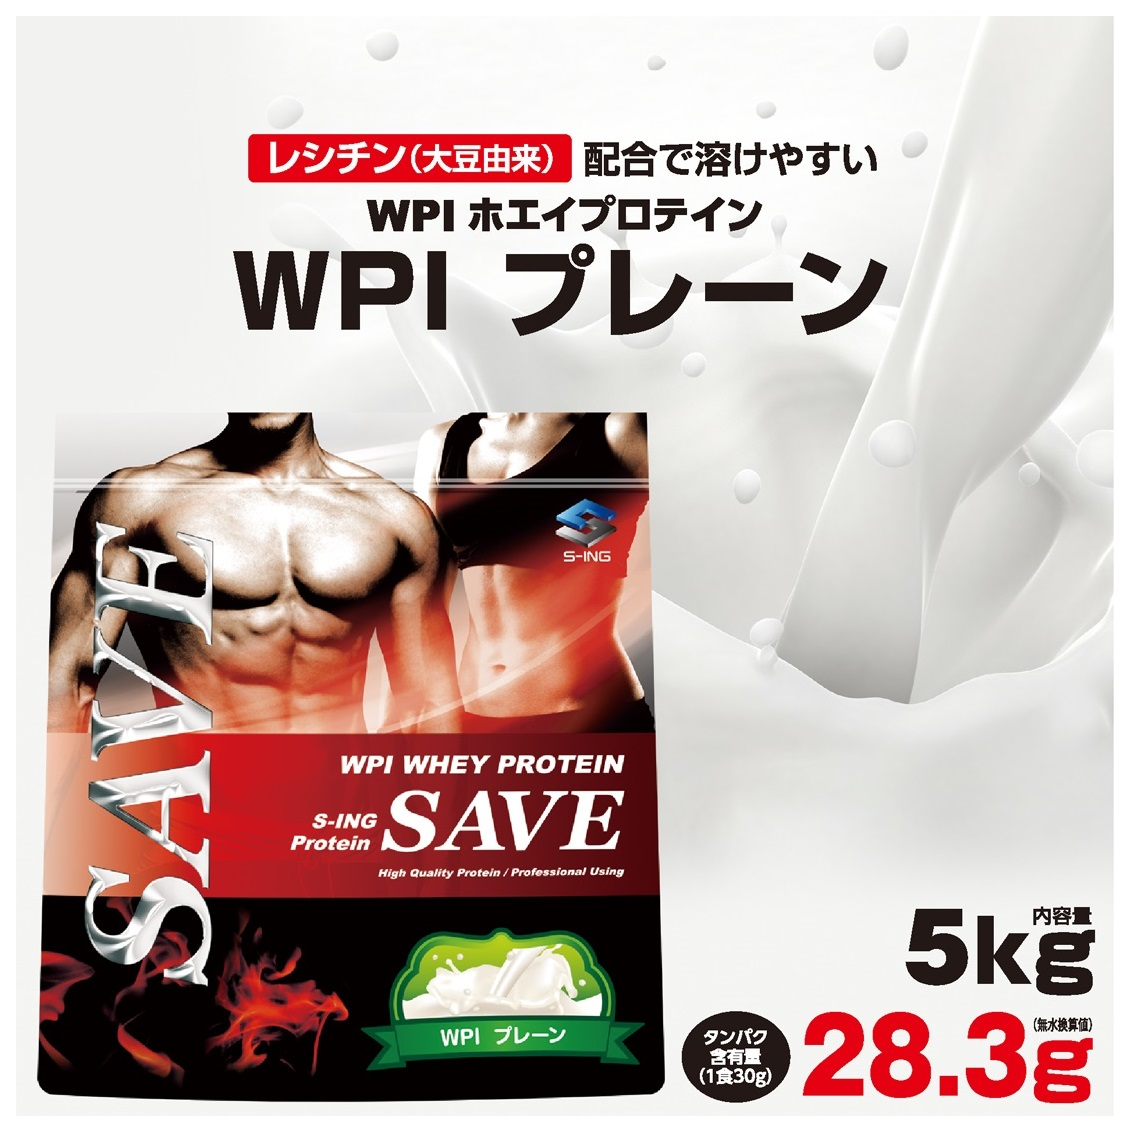 SAVE WPIホエイプロテイン (5kg) 国産 激安【送料無料】